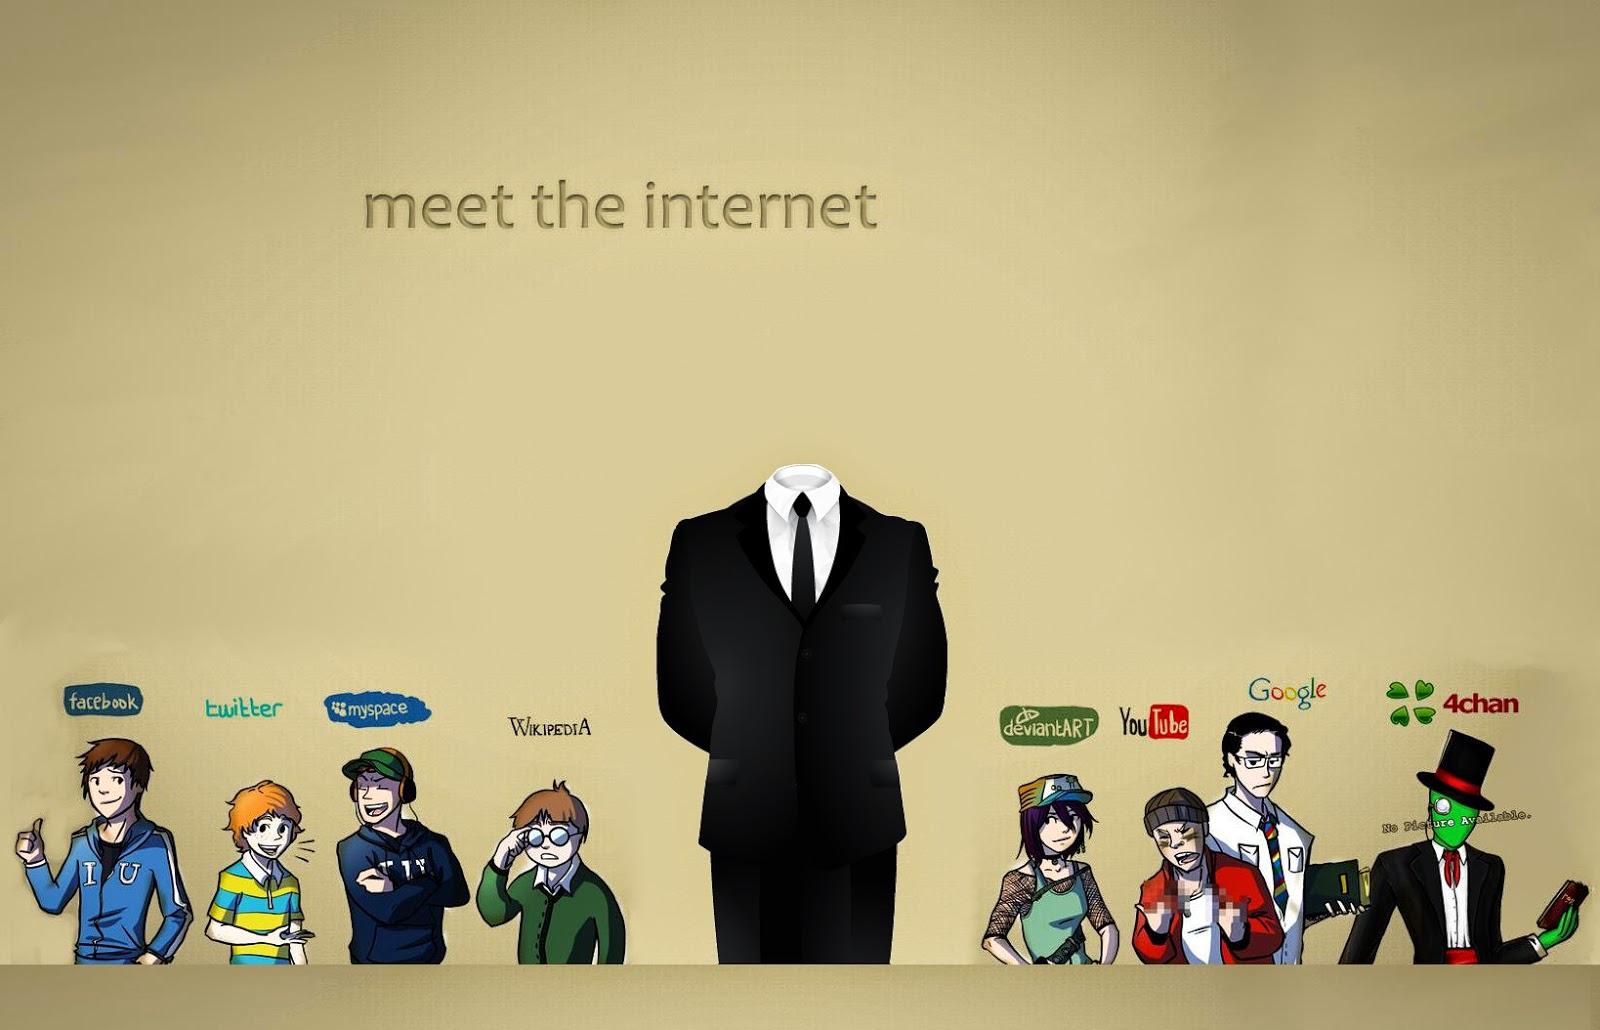 internet tecepat di dunia